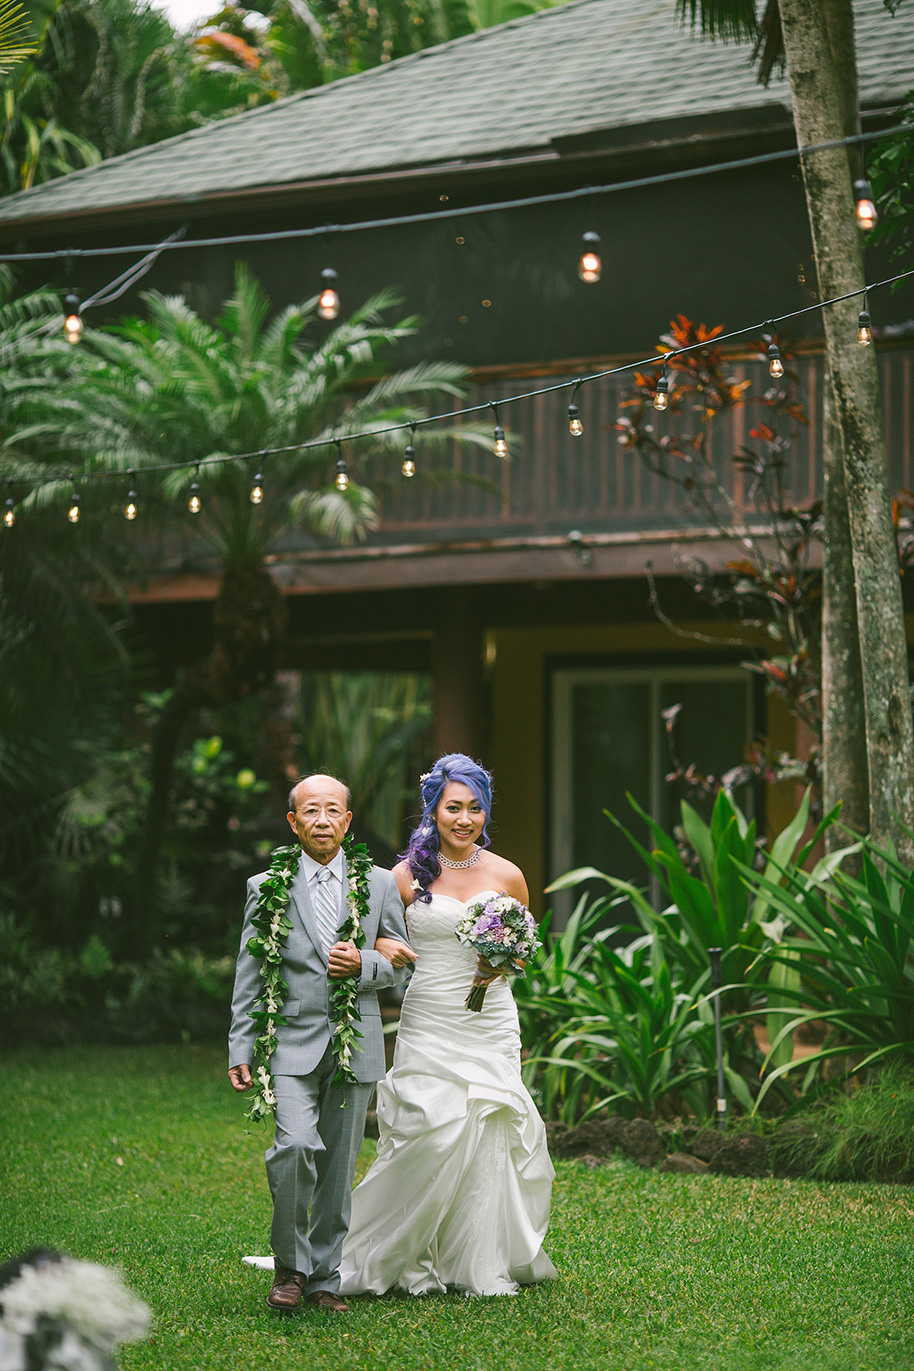 Private-Estate-Wedding-030817-8.jpg